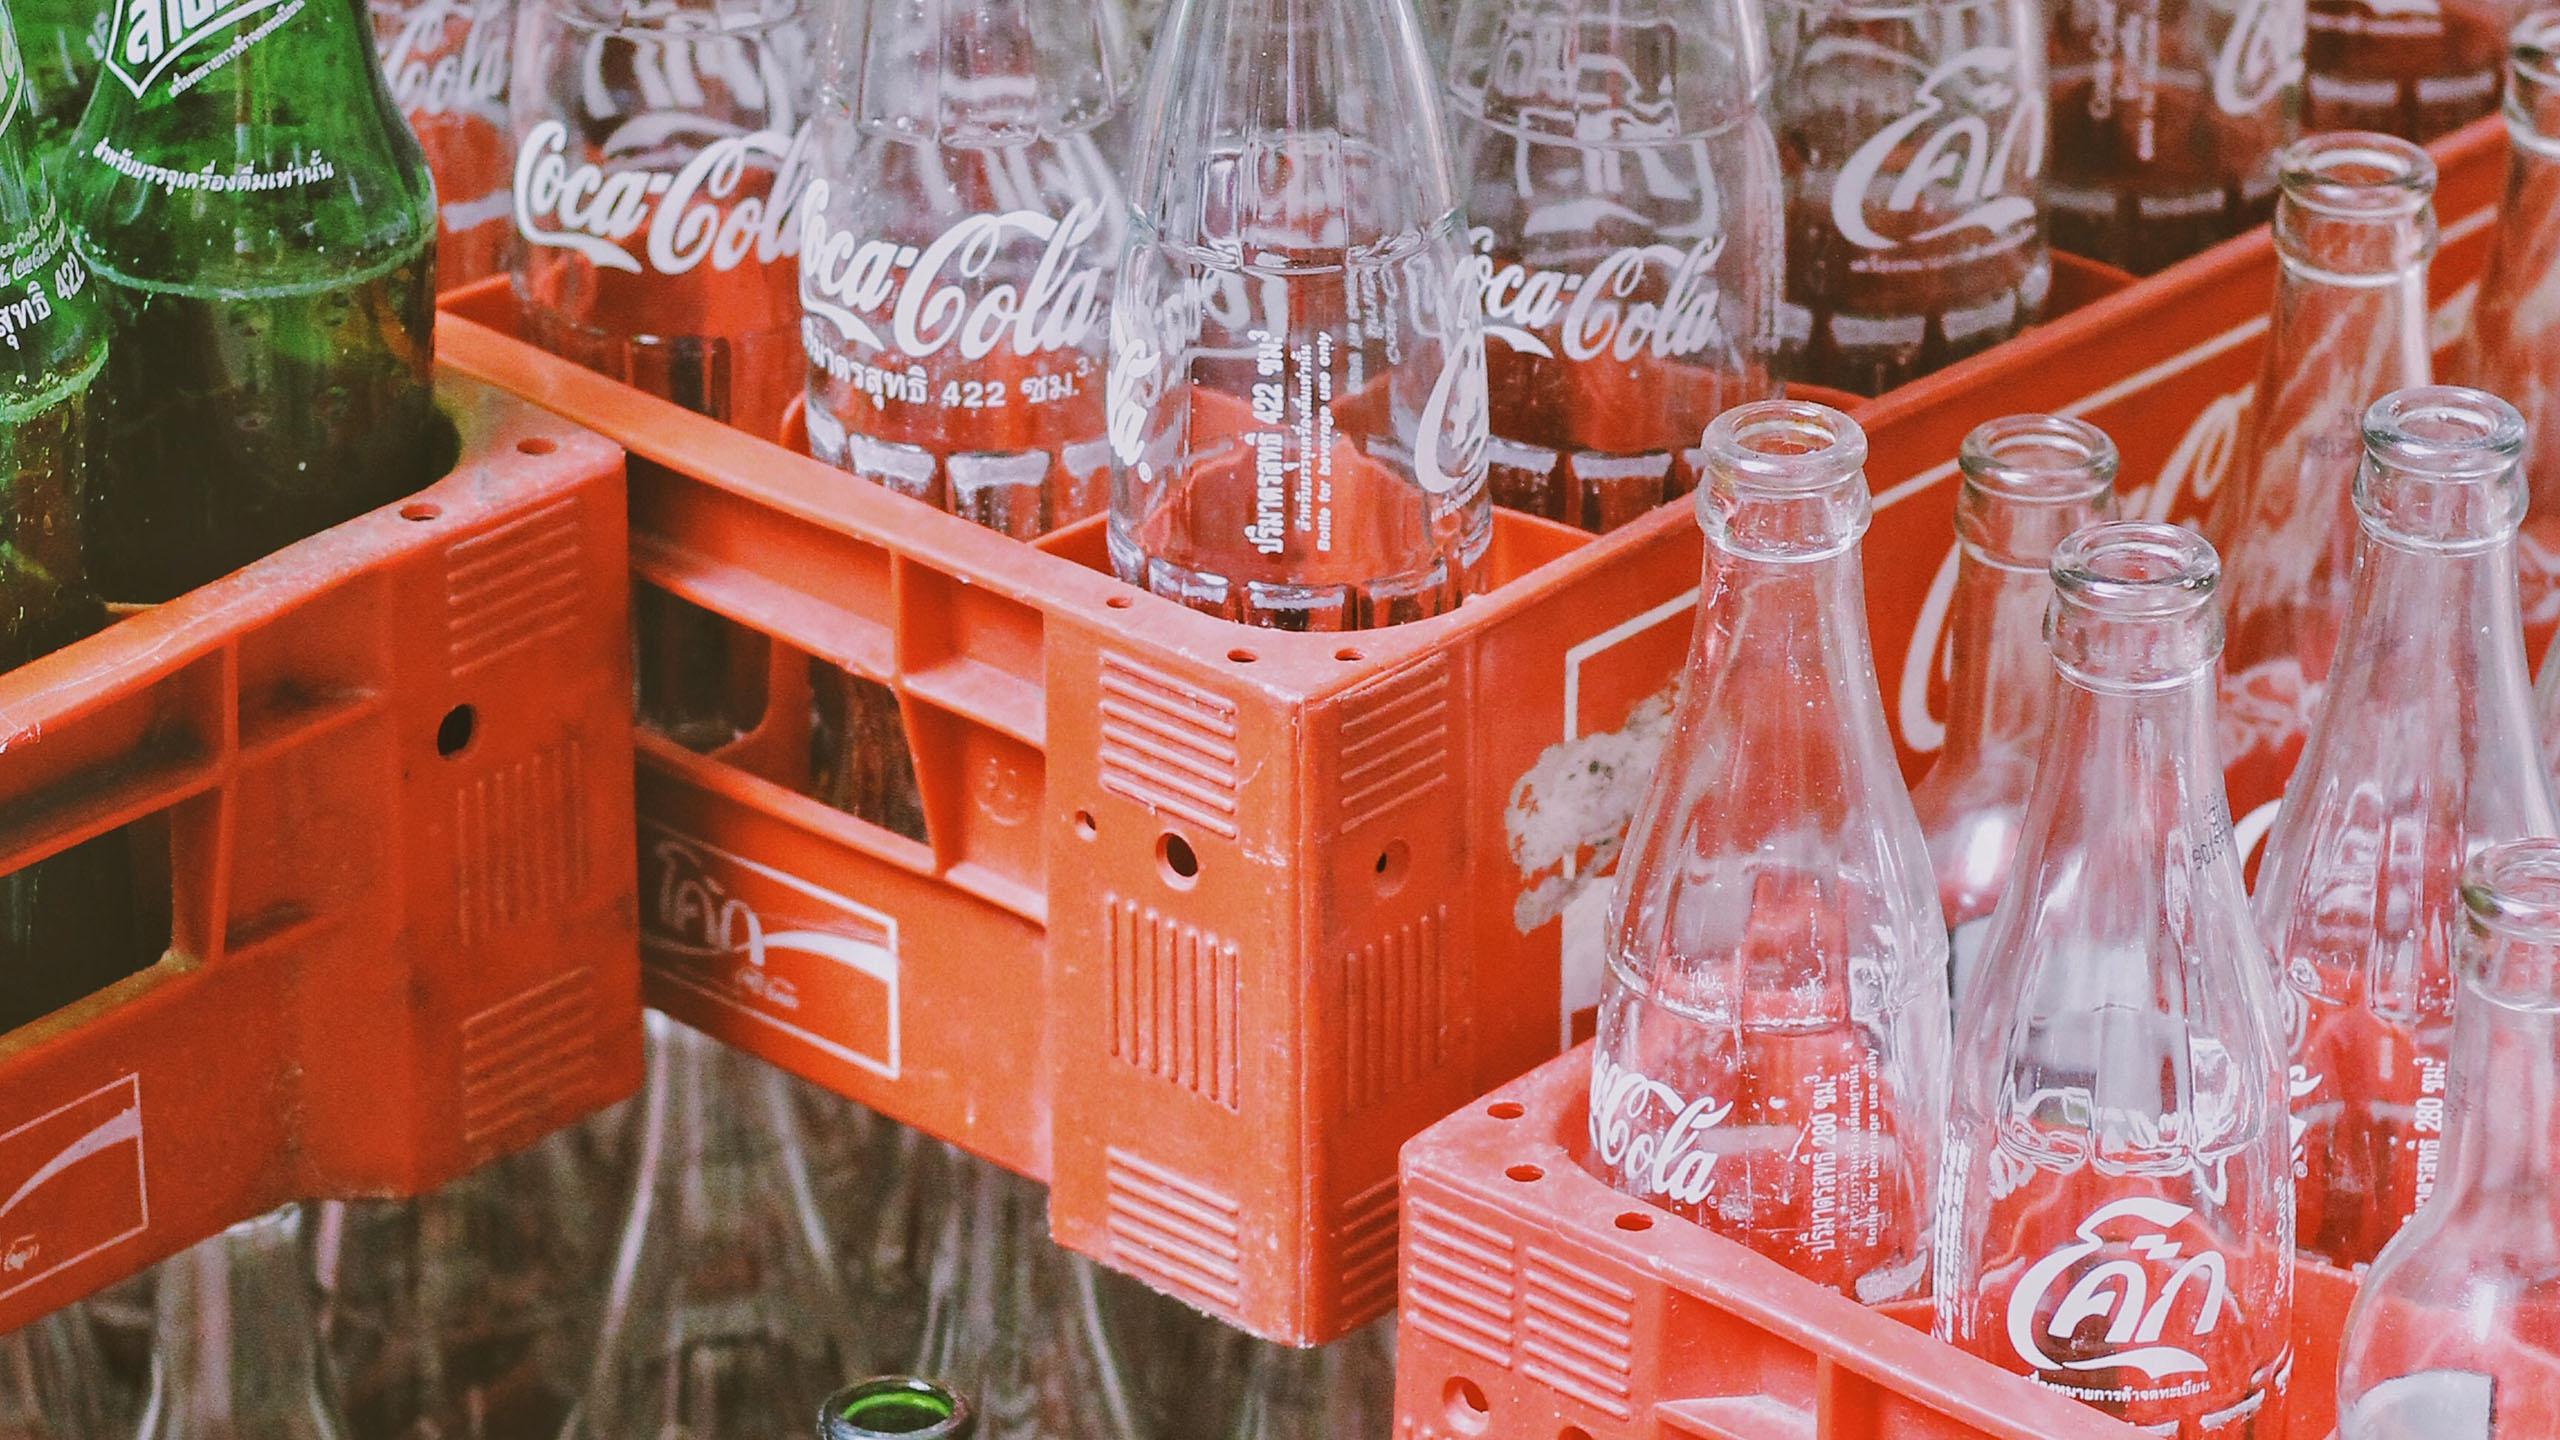 botella de vidrio, refrescos